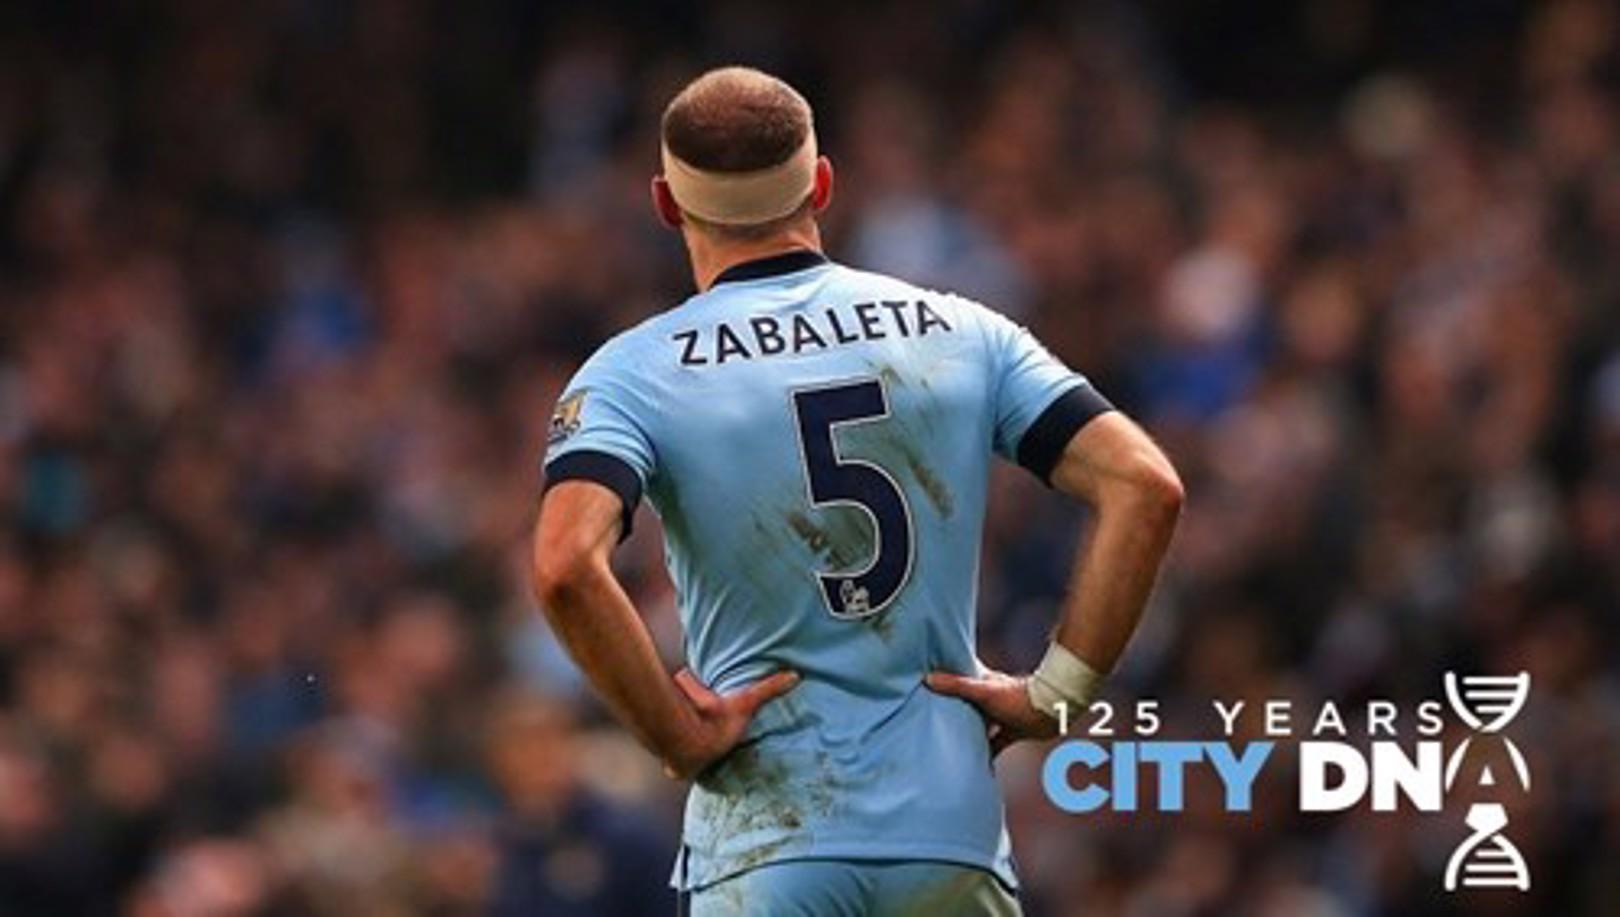 City DNA #69:  Warrior. Legend. Zaba.